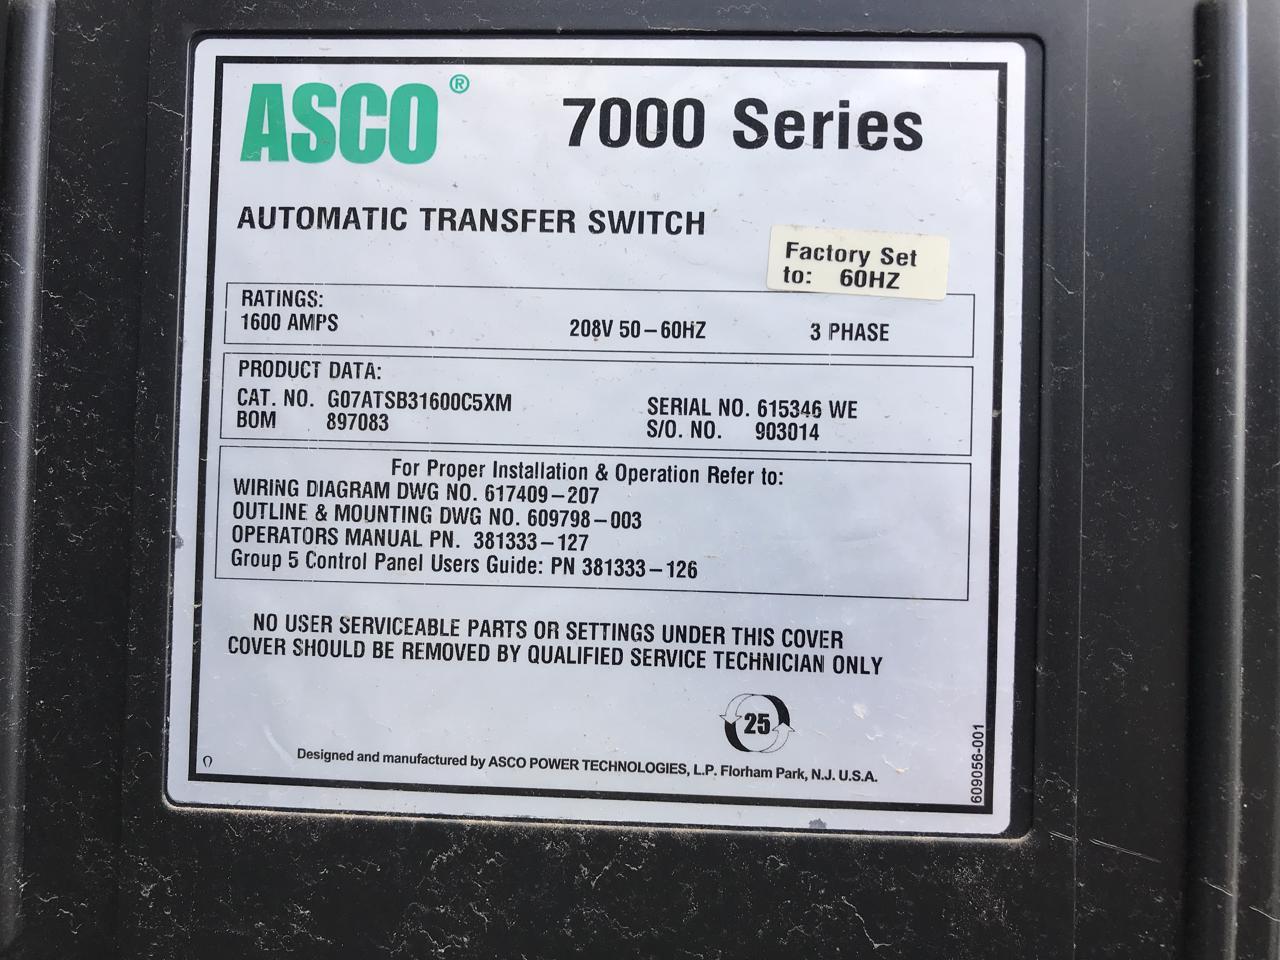 2007 7000 Series Asco 1600 Amp 208 Volt Transfer Switch Nema 3 W Automatic Wiring Diagram Iets 167 As 8